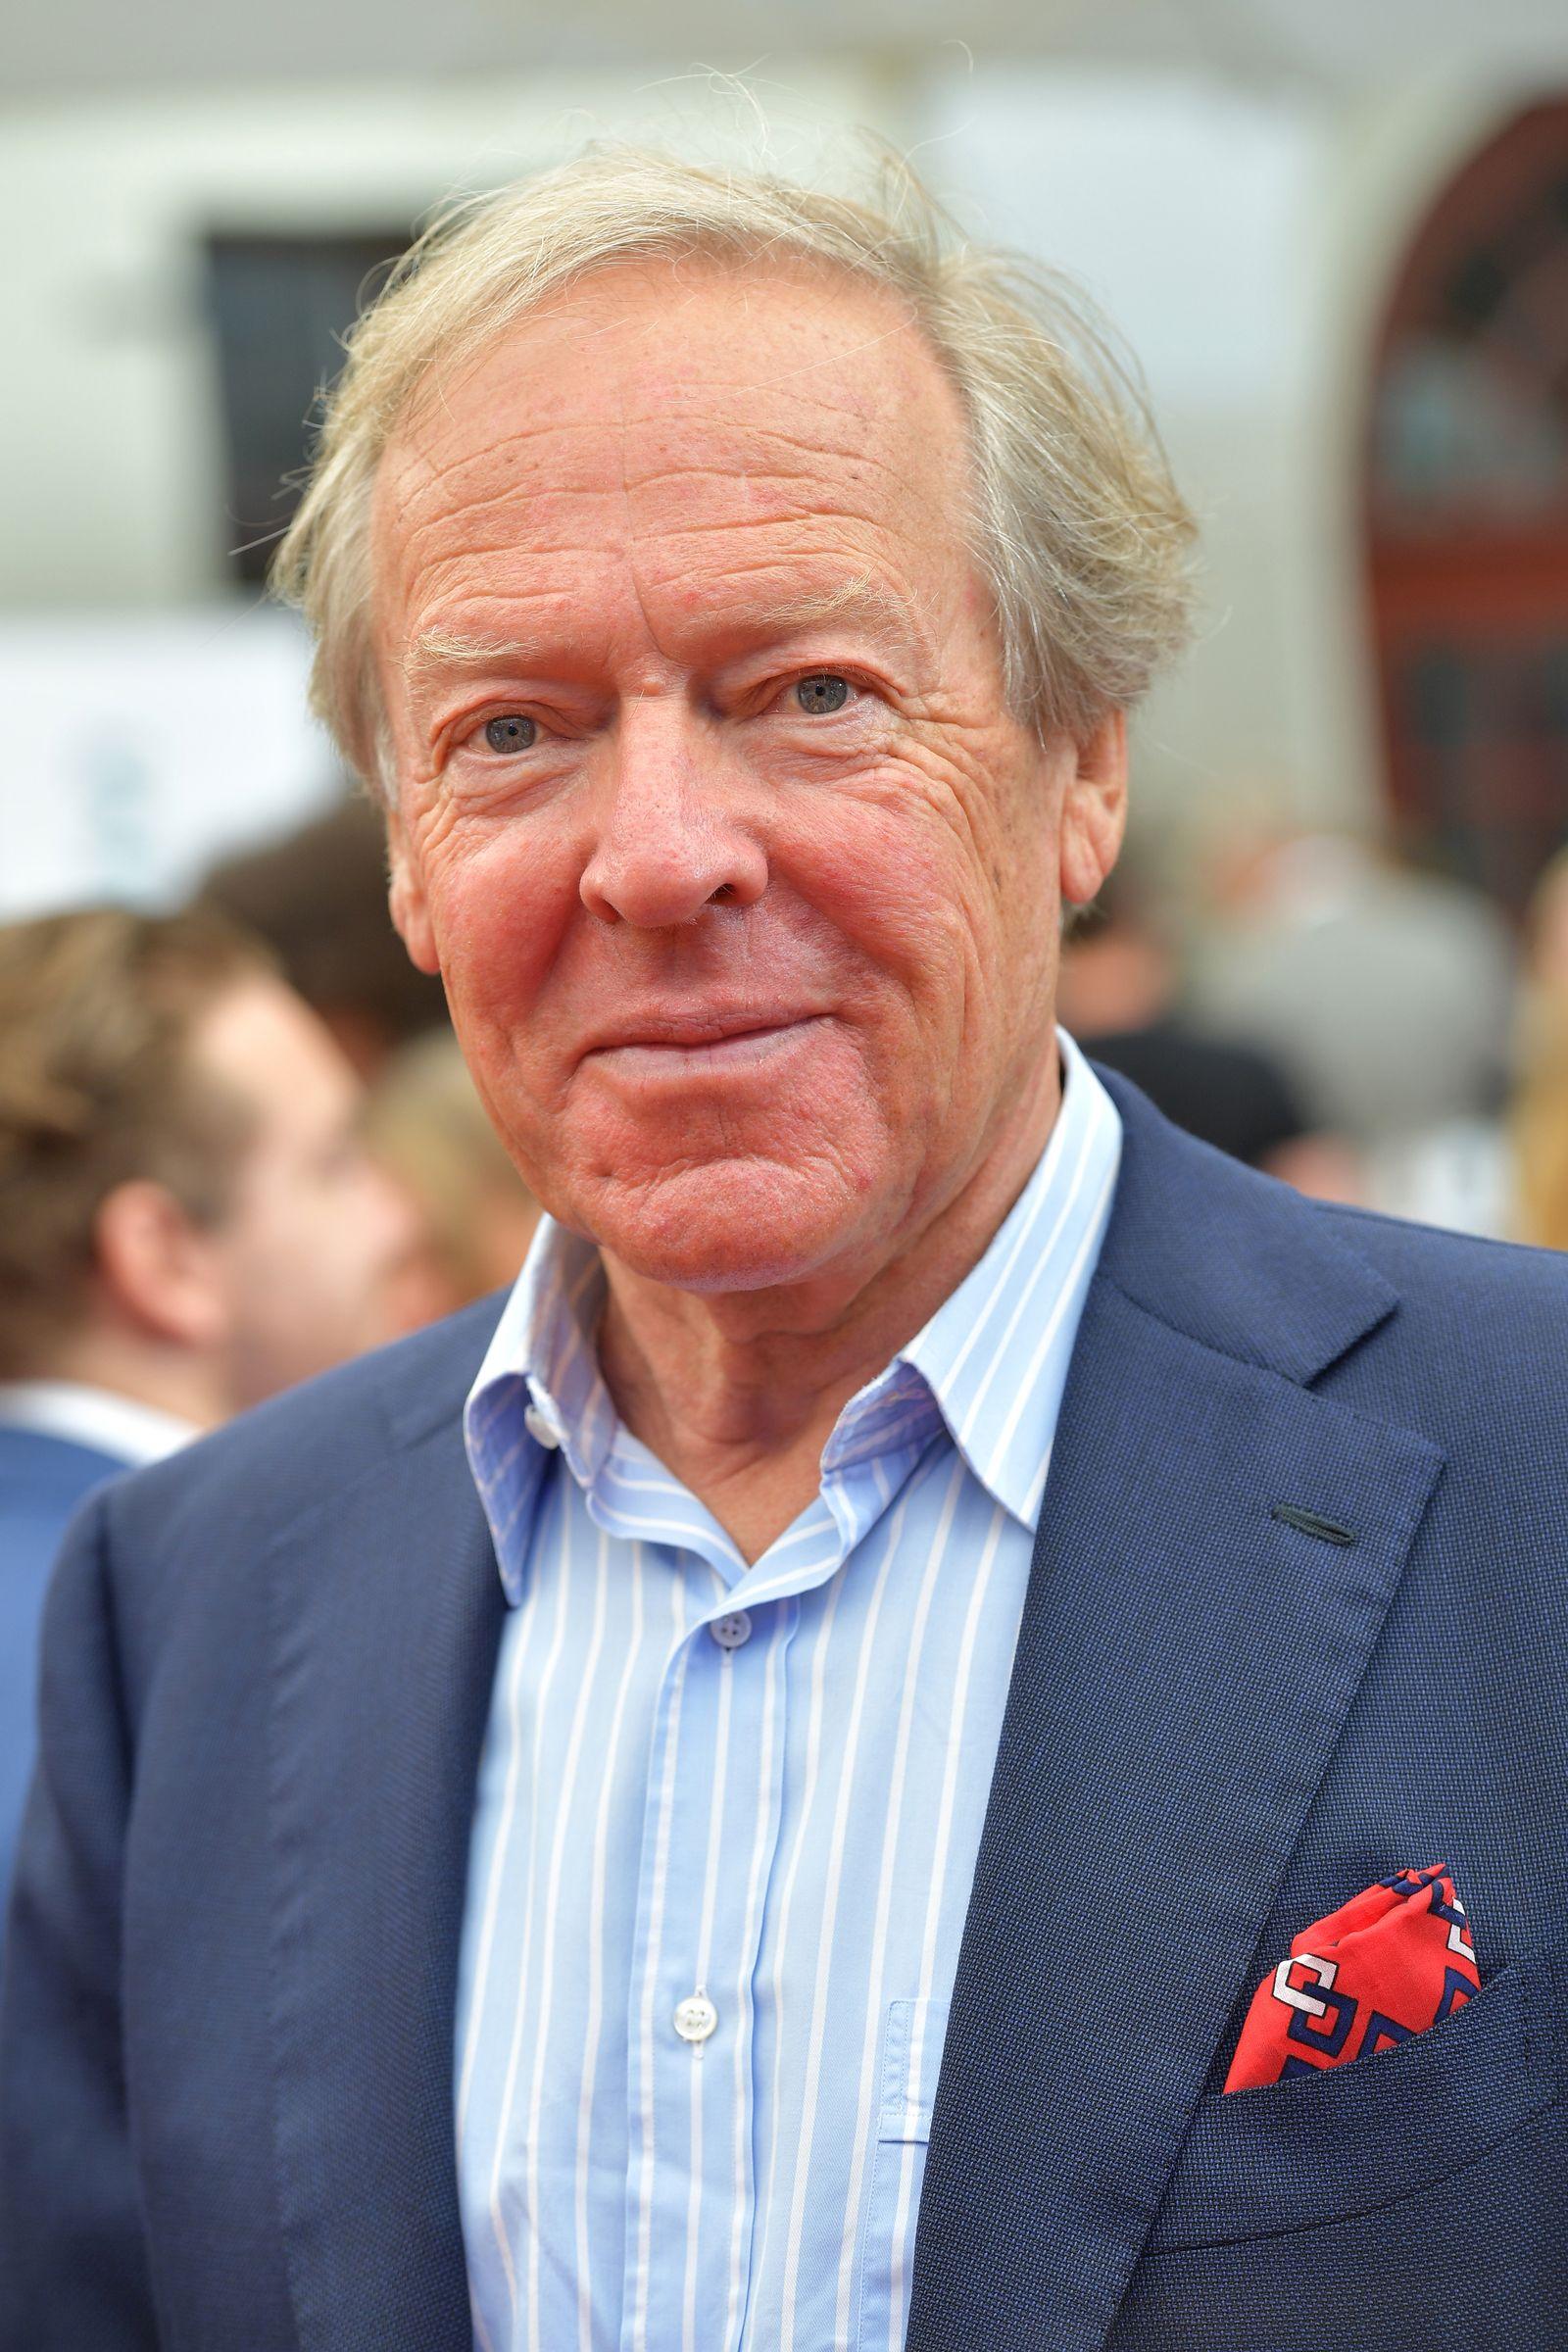 Herbert Kloiber